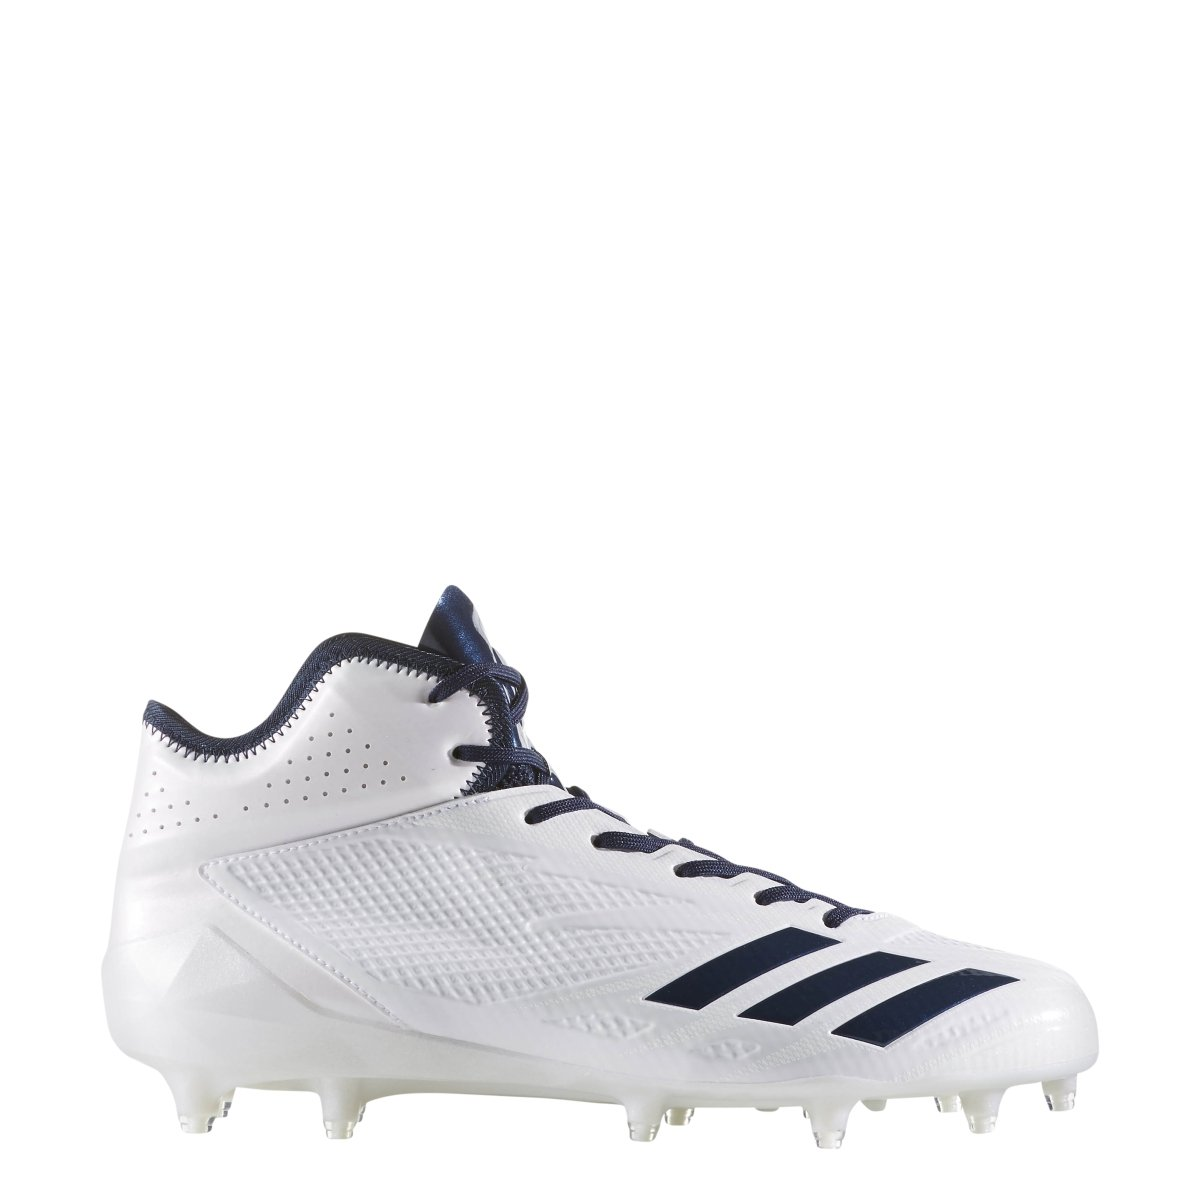 adidas Adizero 5Star 6.0 Mid Cleat Men's Football B071RS5FTS 9 D(M) US White-collegiate Navy-collegiate Navy